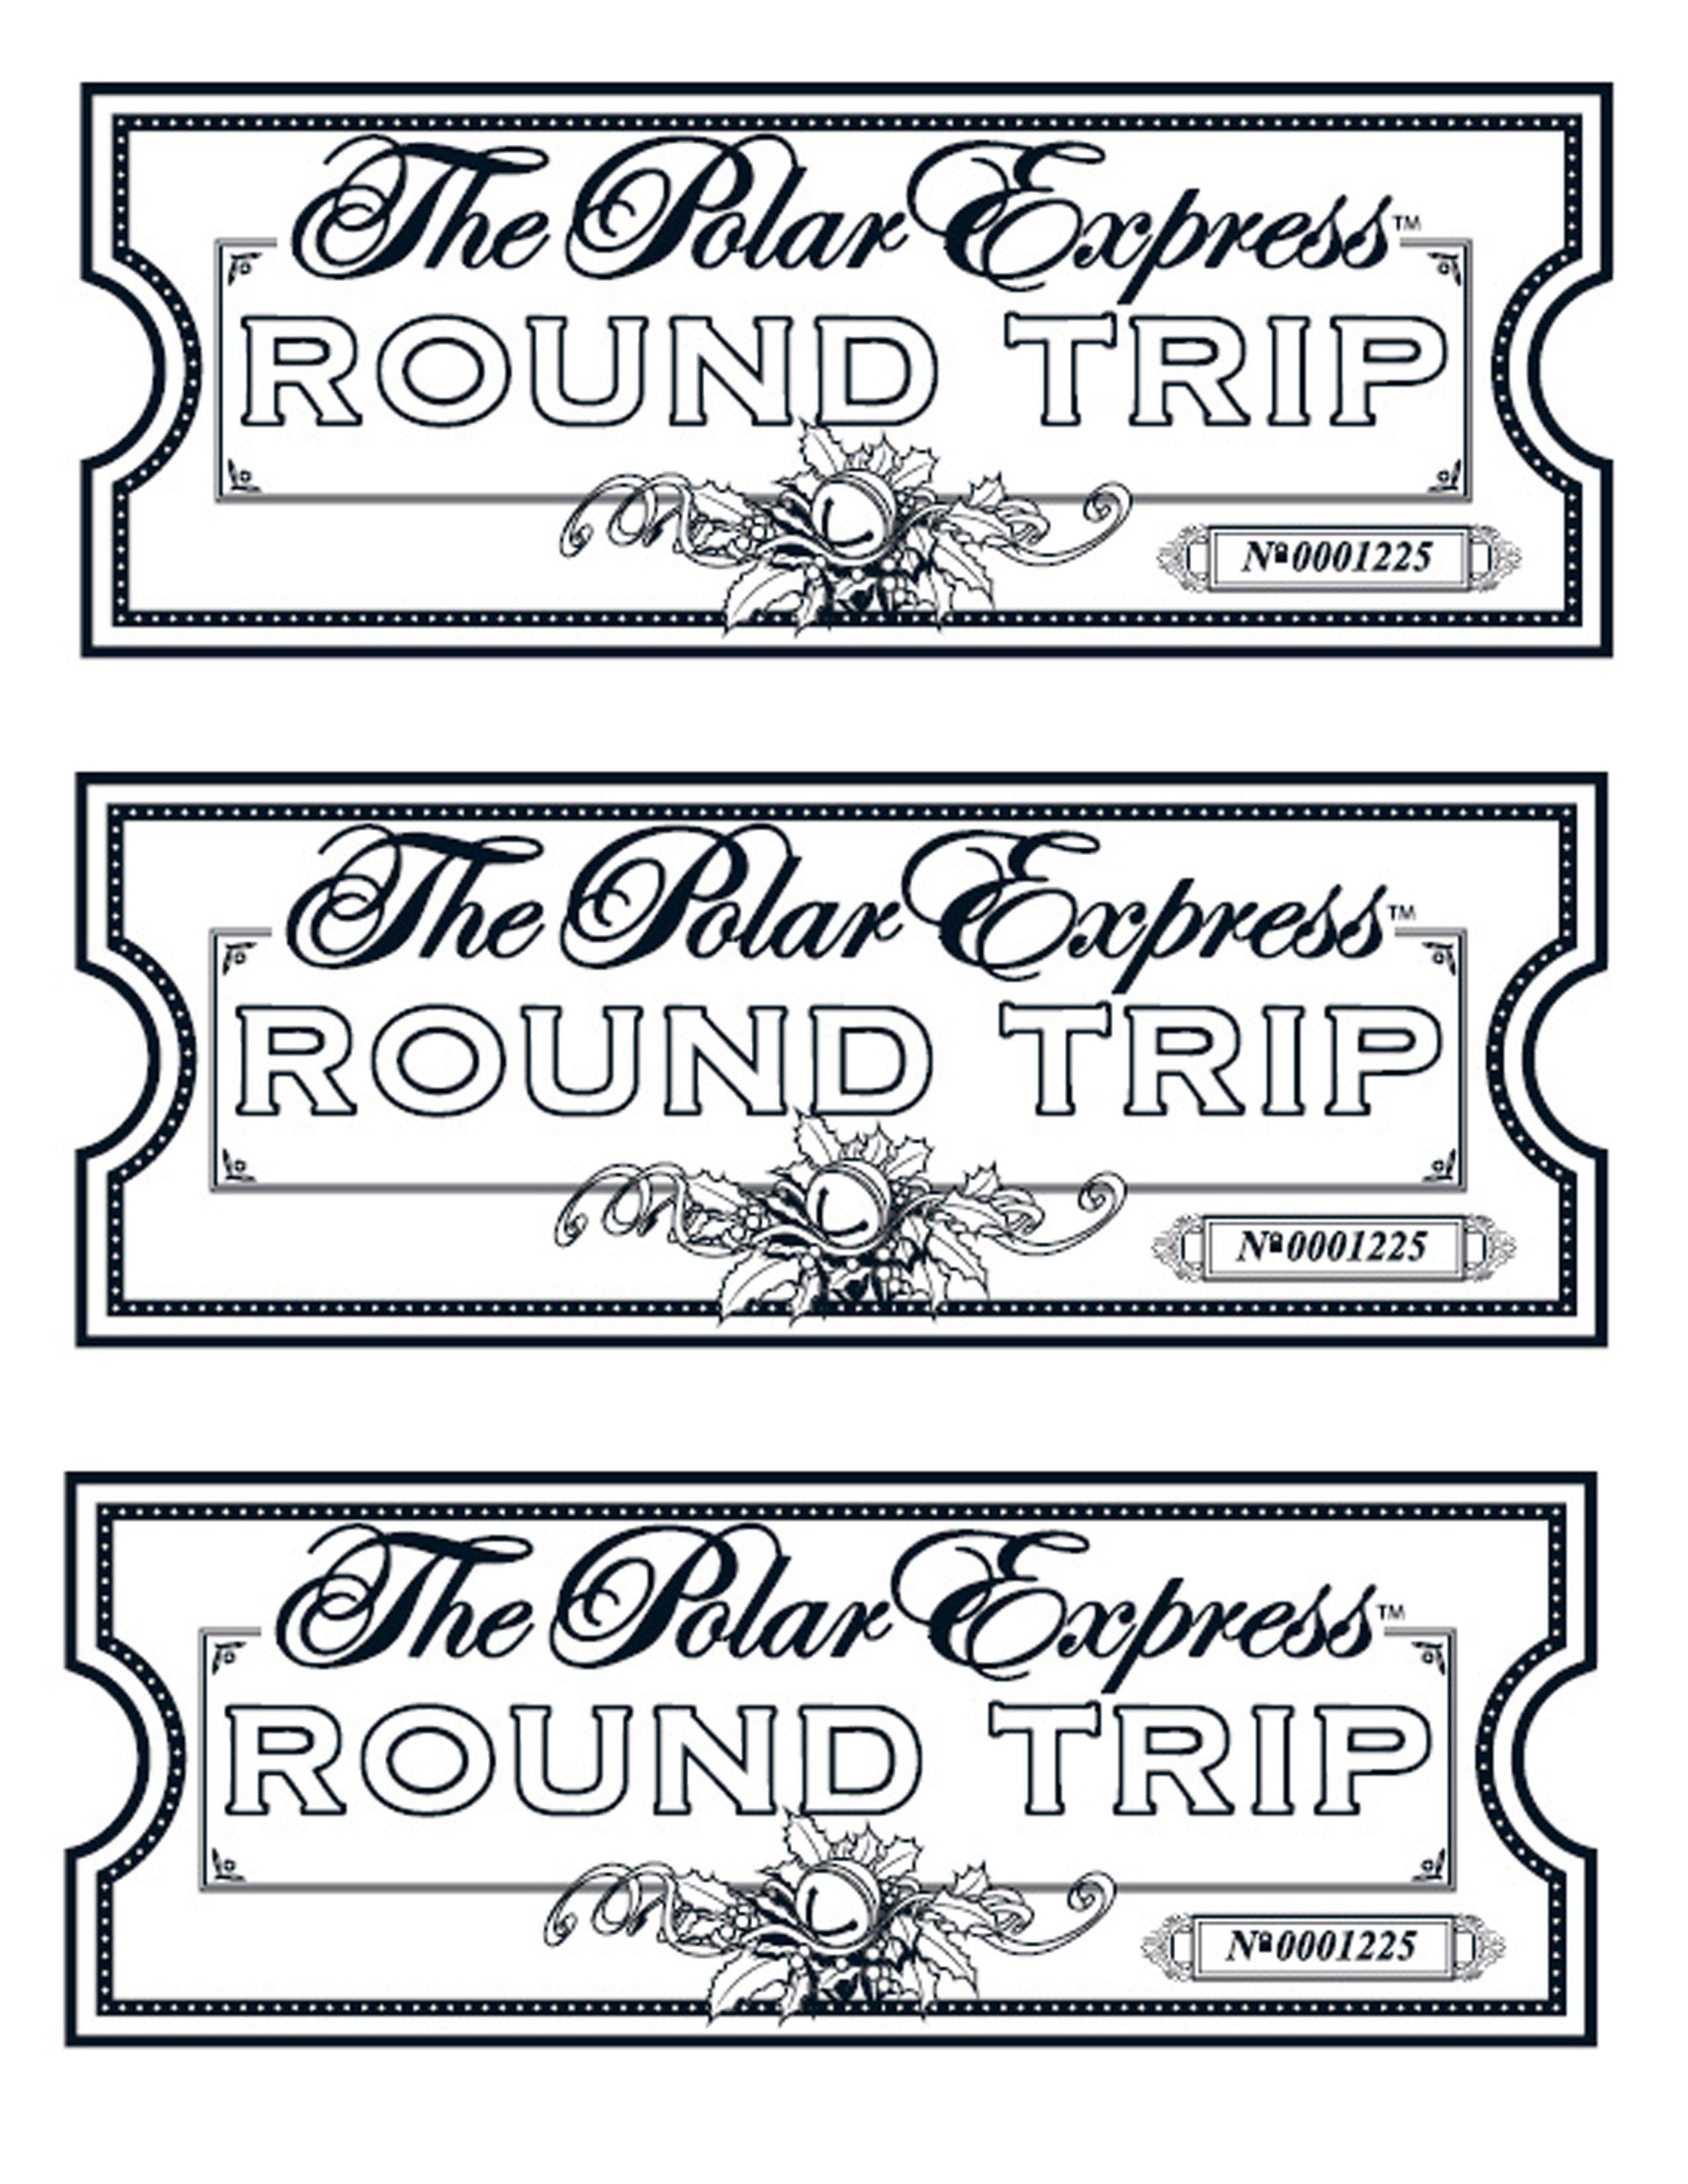 Image Result For Polar Express Tickets Polar Express Tickets